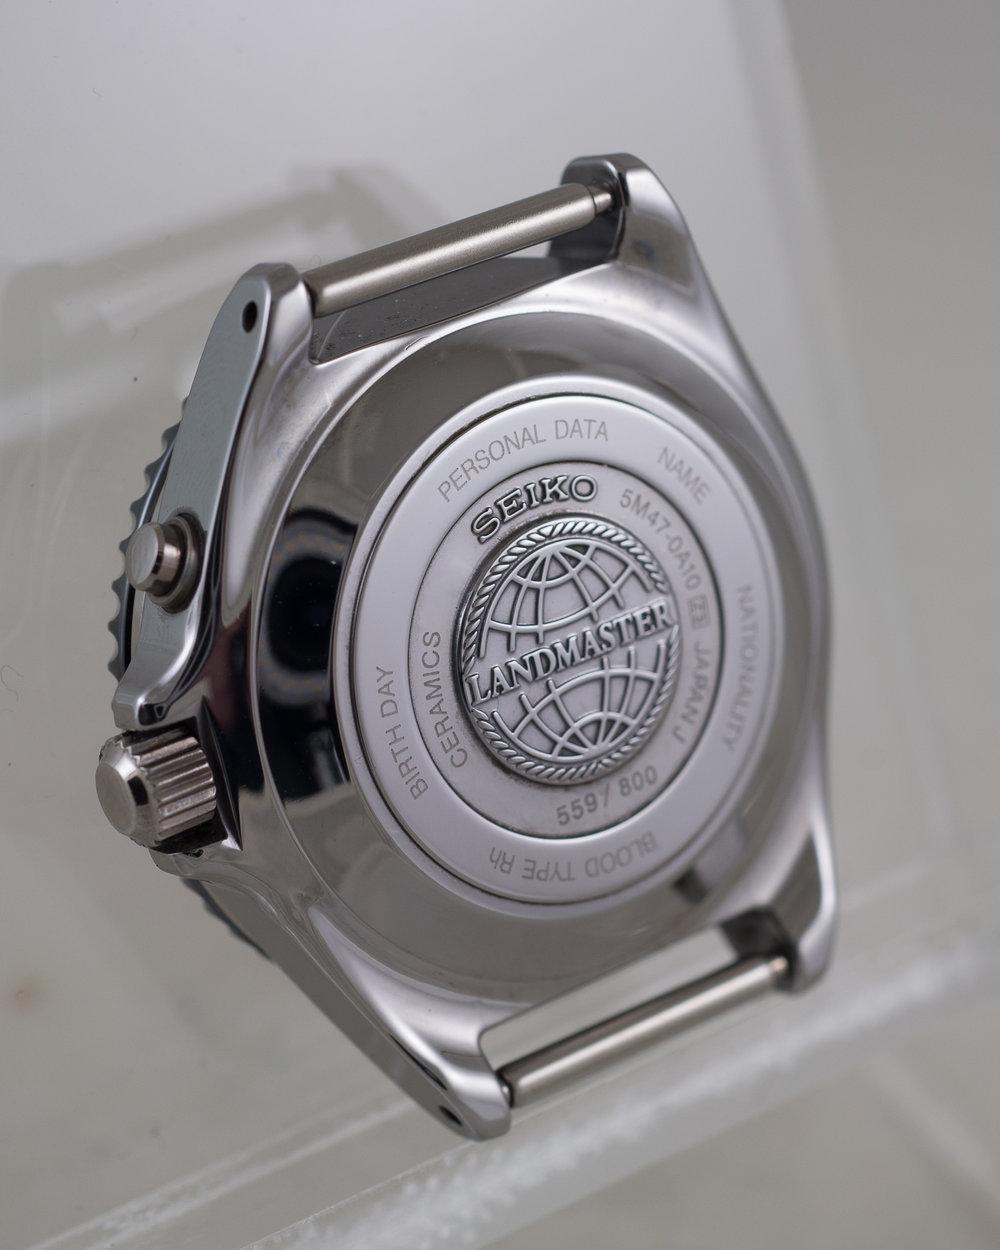 SBCW023 LandMaster South Pole